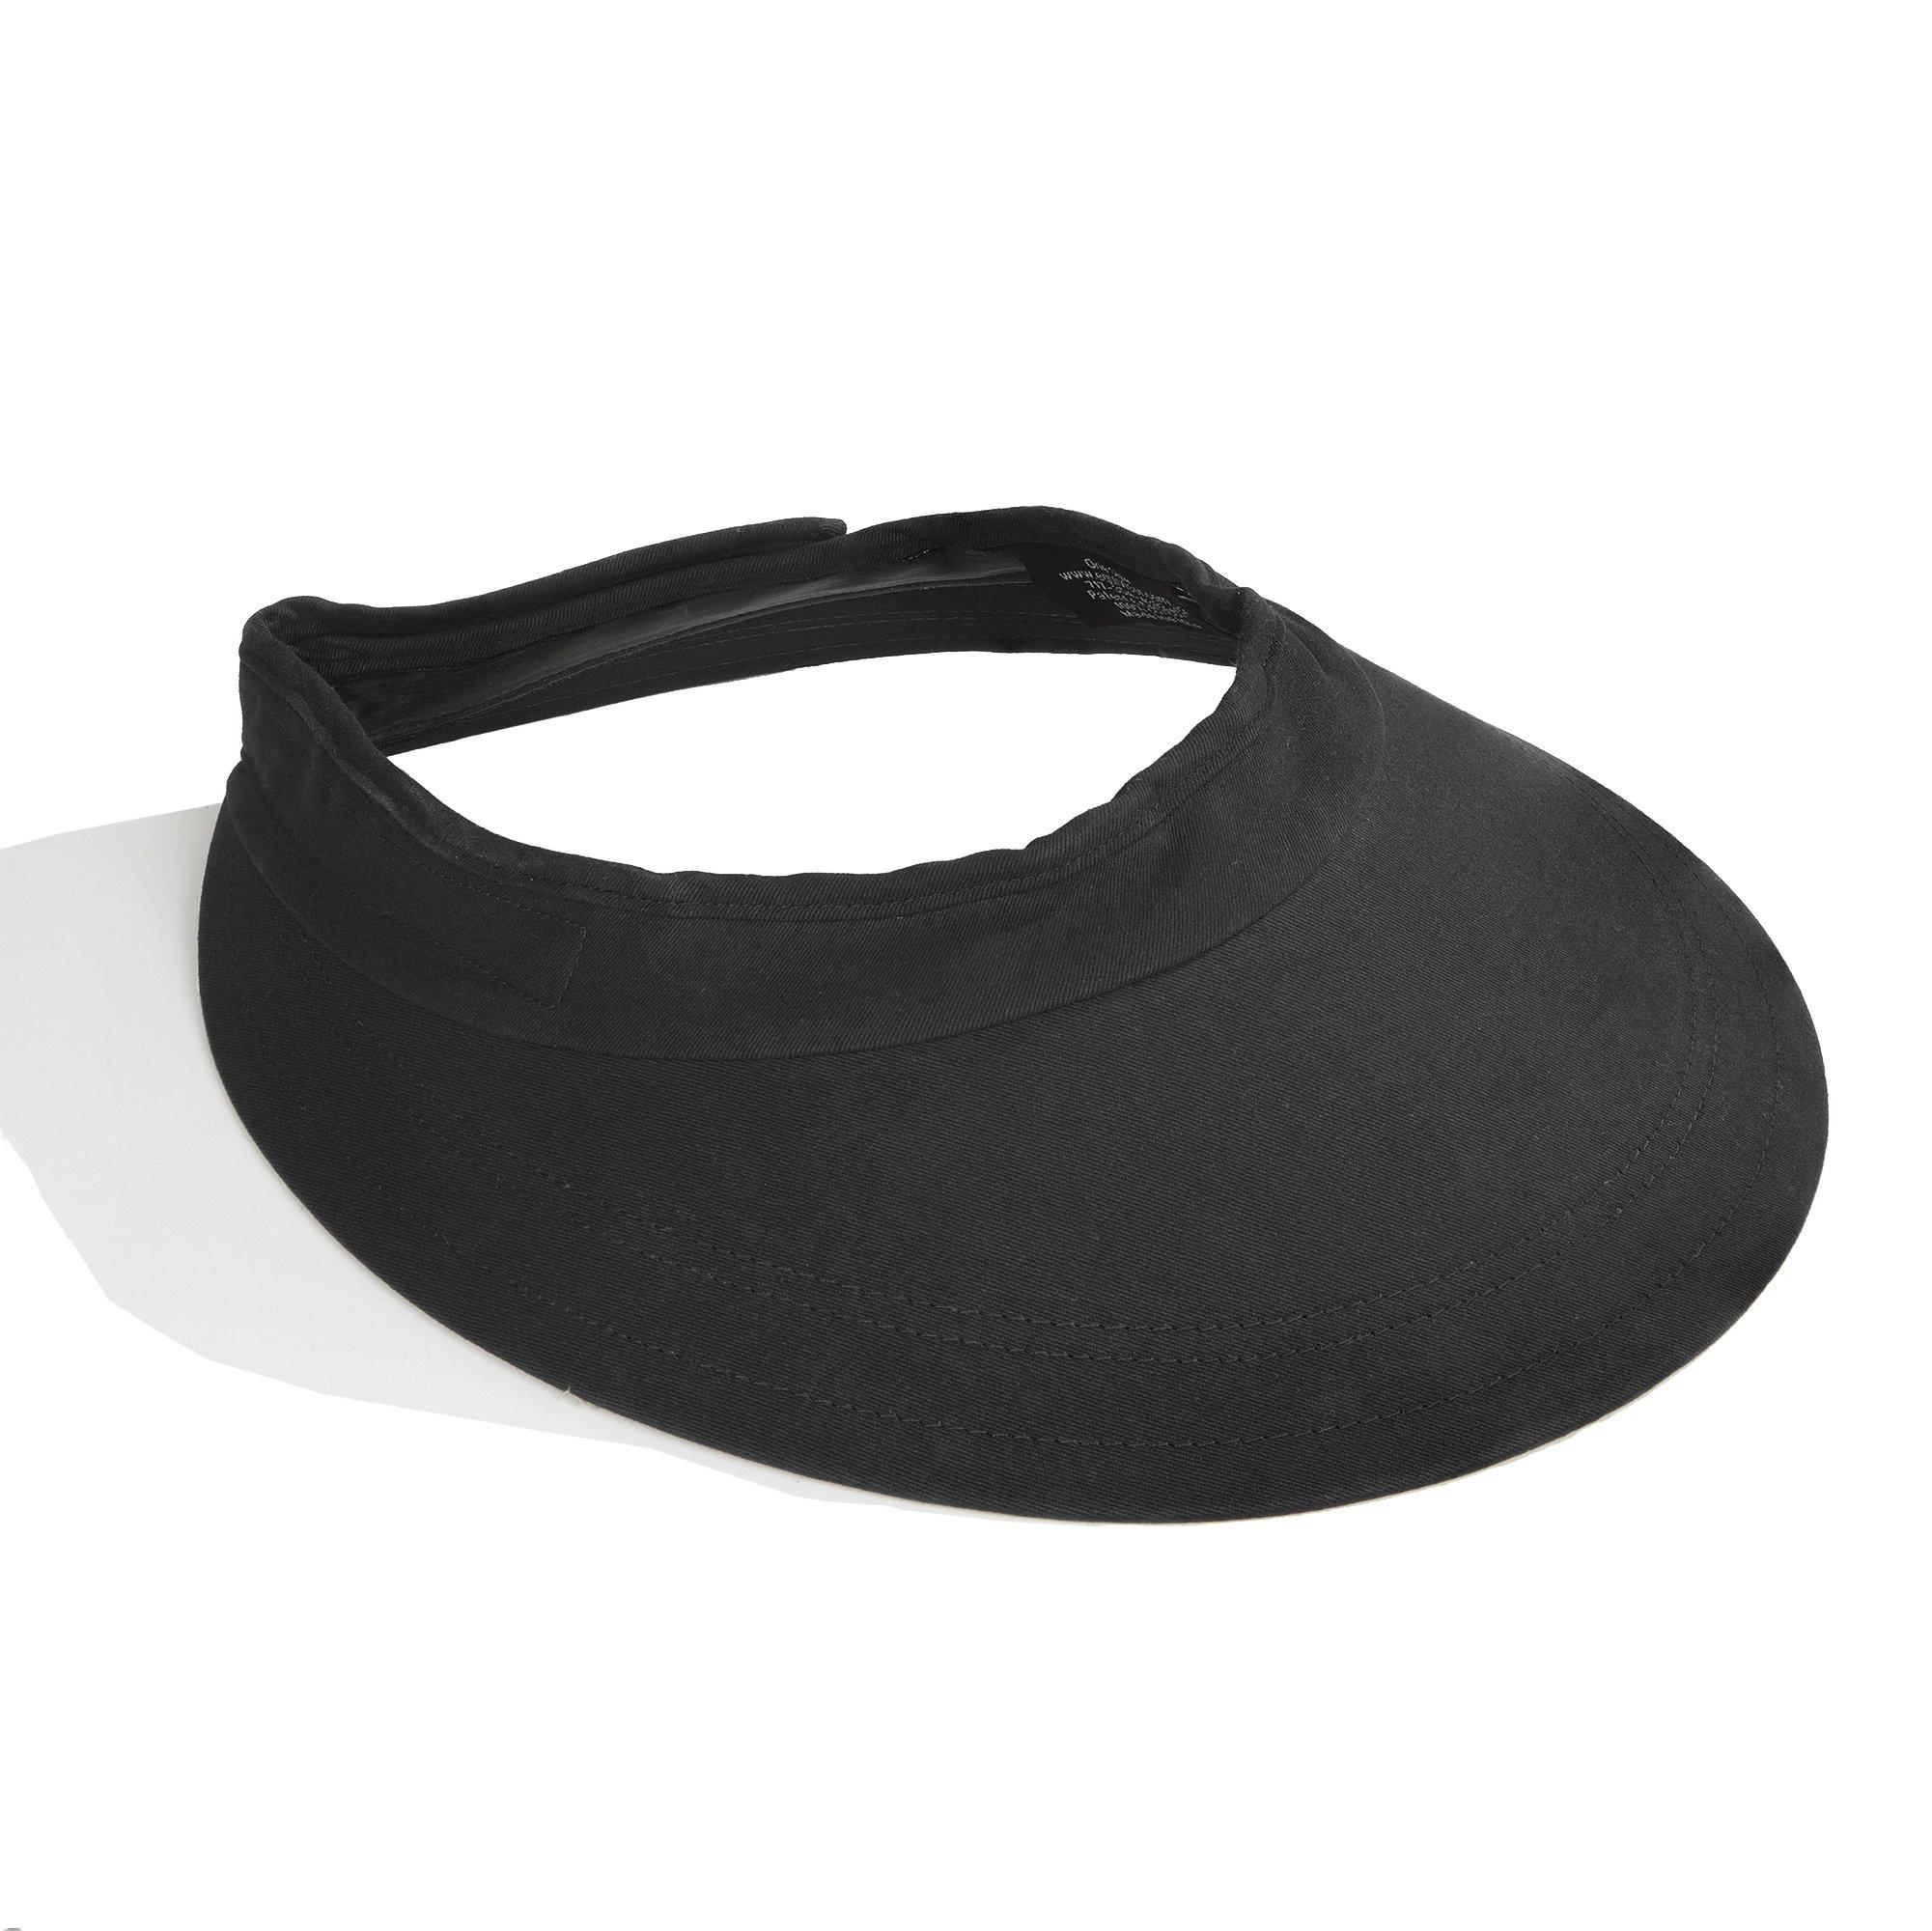 Intrepid International Equivisor Cotton Helmet